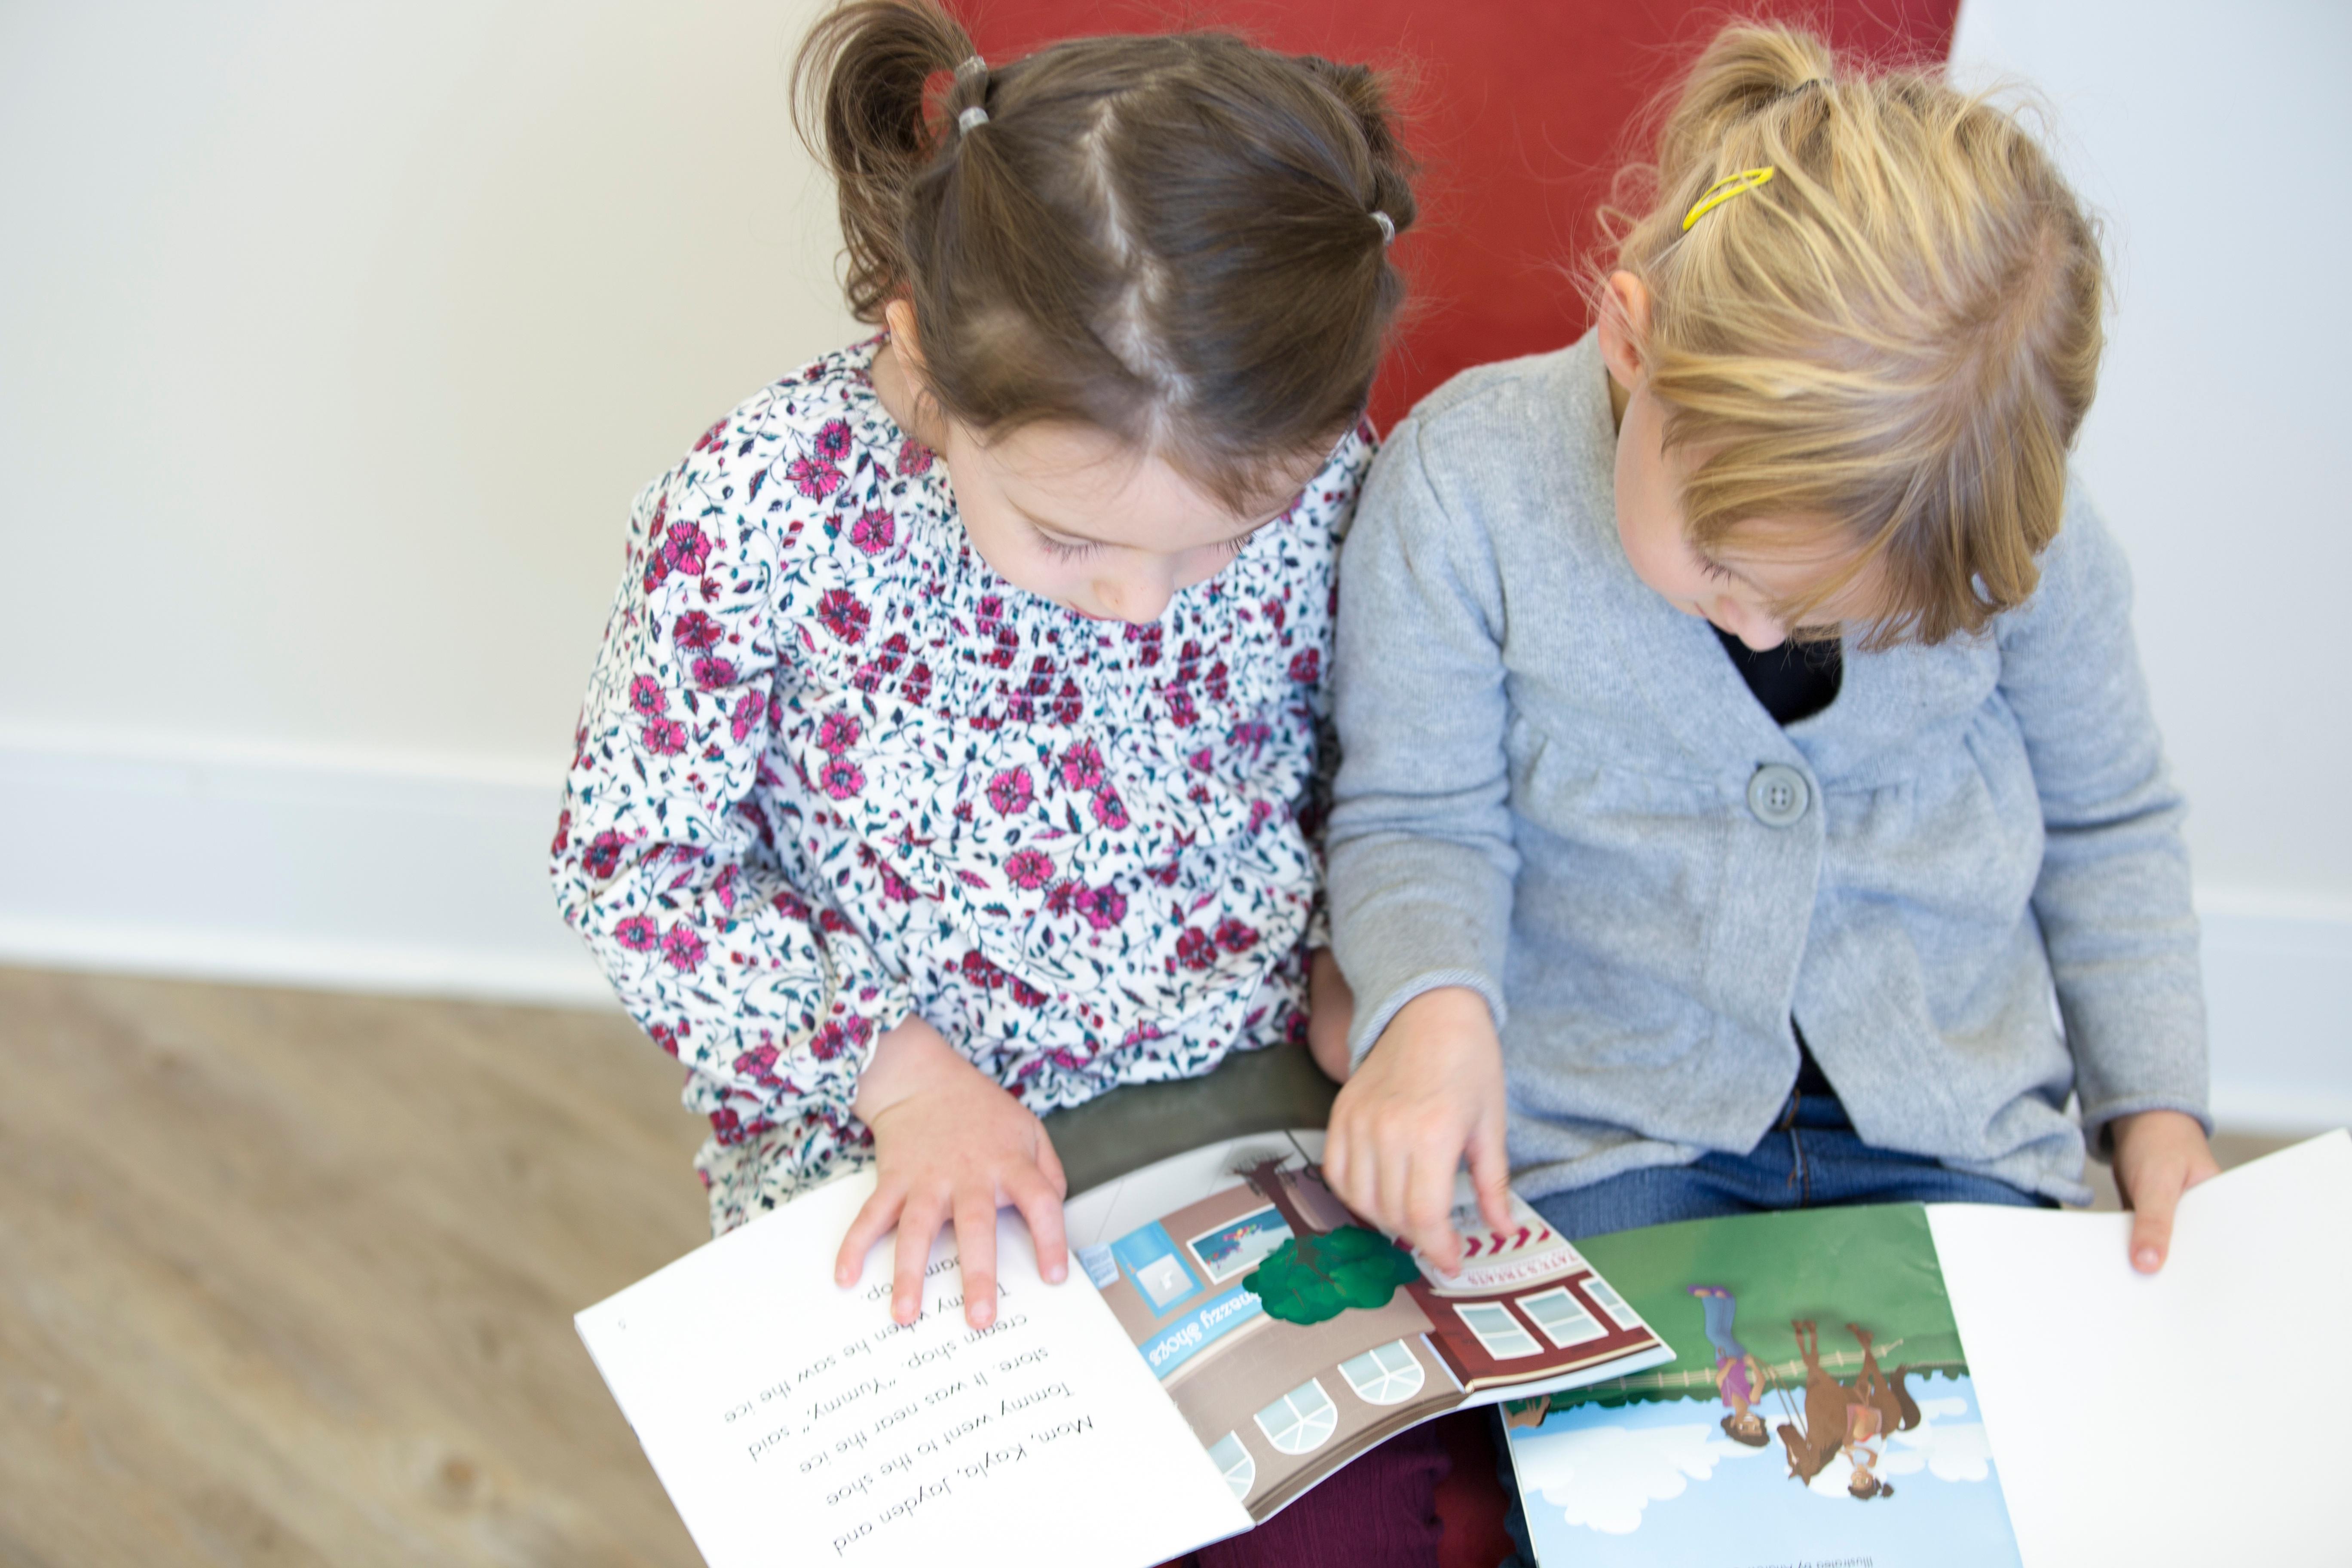 halifax learning spellread reading program reading support evidence-driven